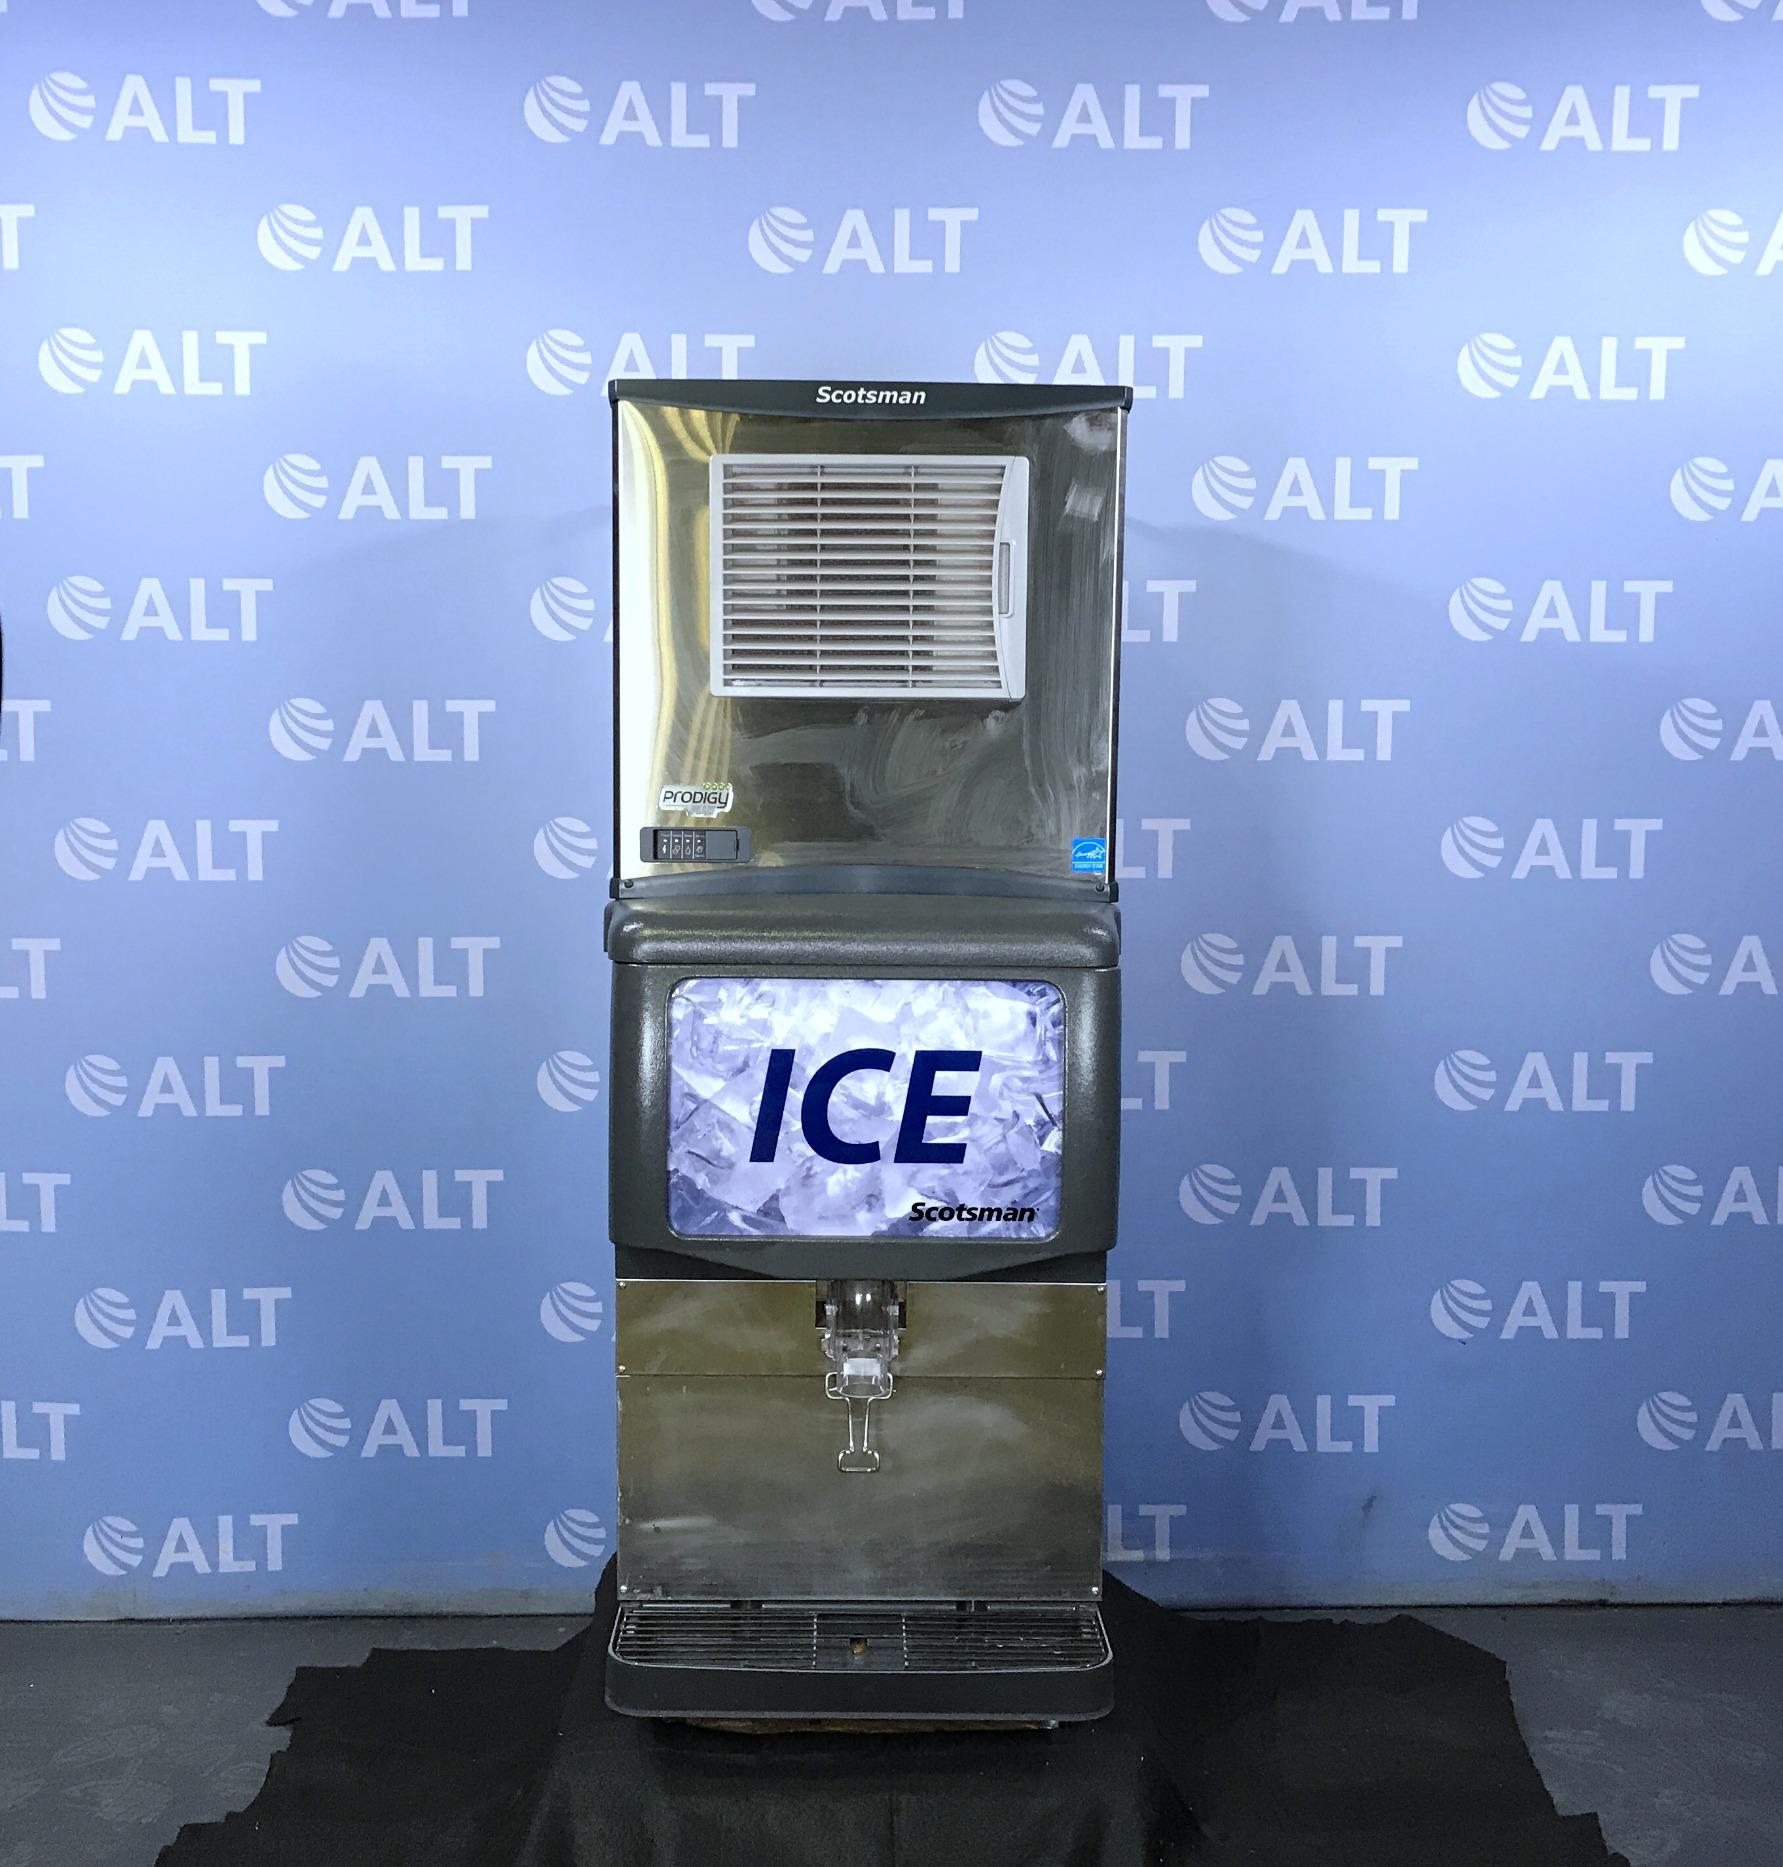 Scotsman Prodigy Plus Ice Maker Model 1D150B-1A Image